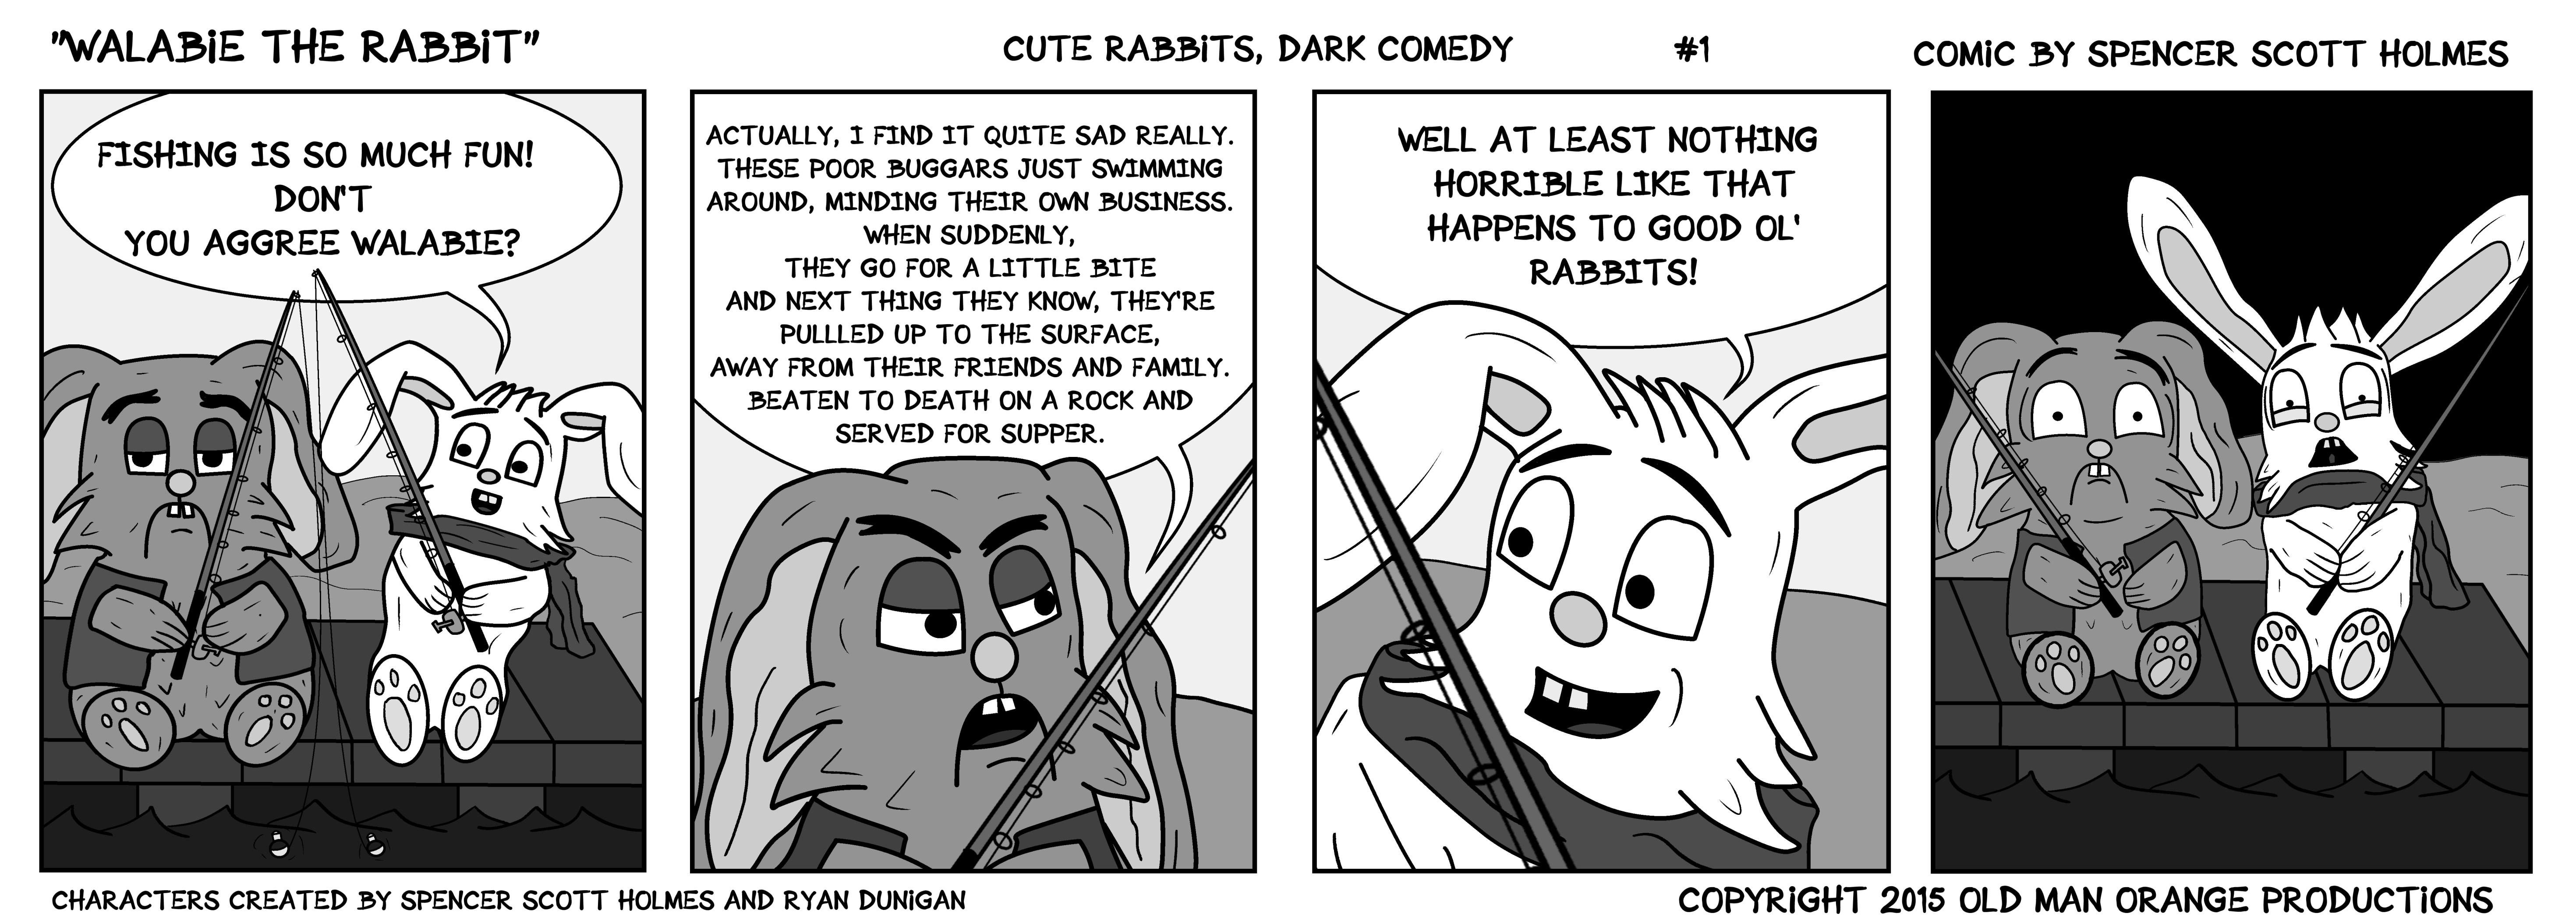 Walabie The Rabbit - Cartoon Strip 1-1